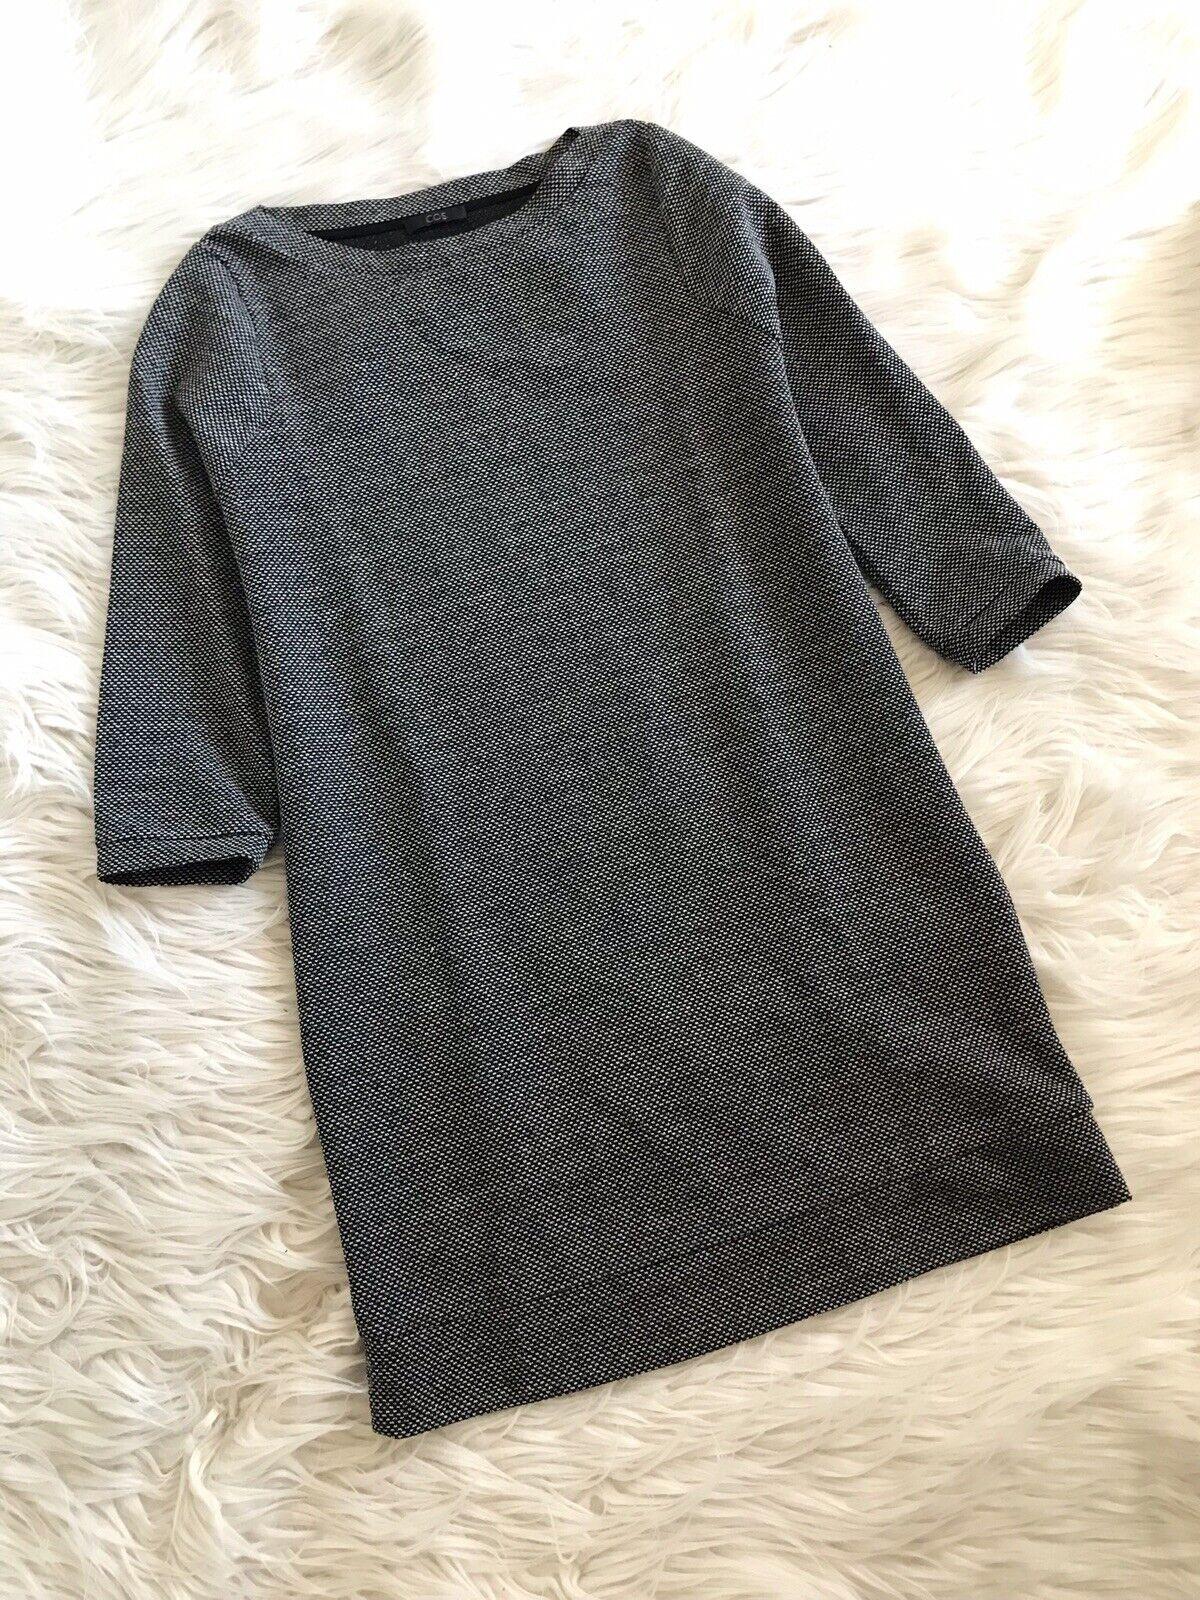 COS Damenkleid Kleid Kastig Business Leger Schwarz Weiß Meliert Grau XS S 34 36